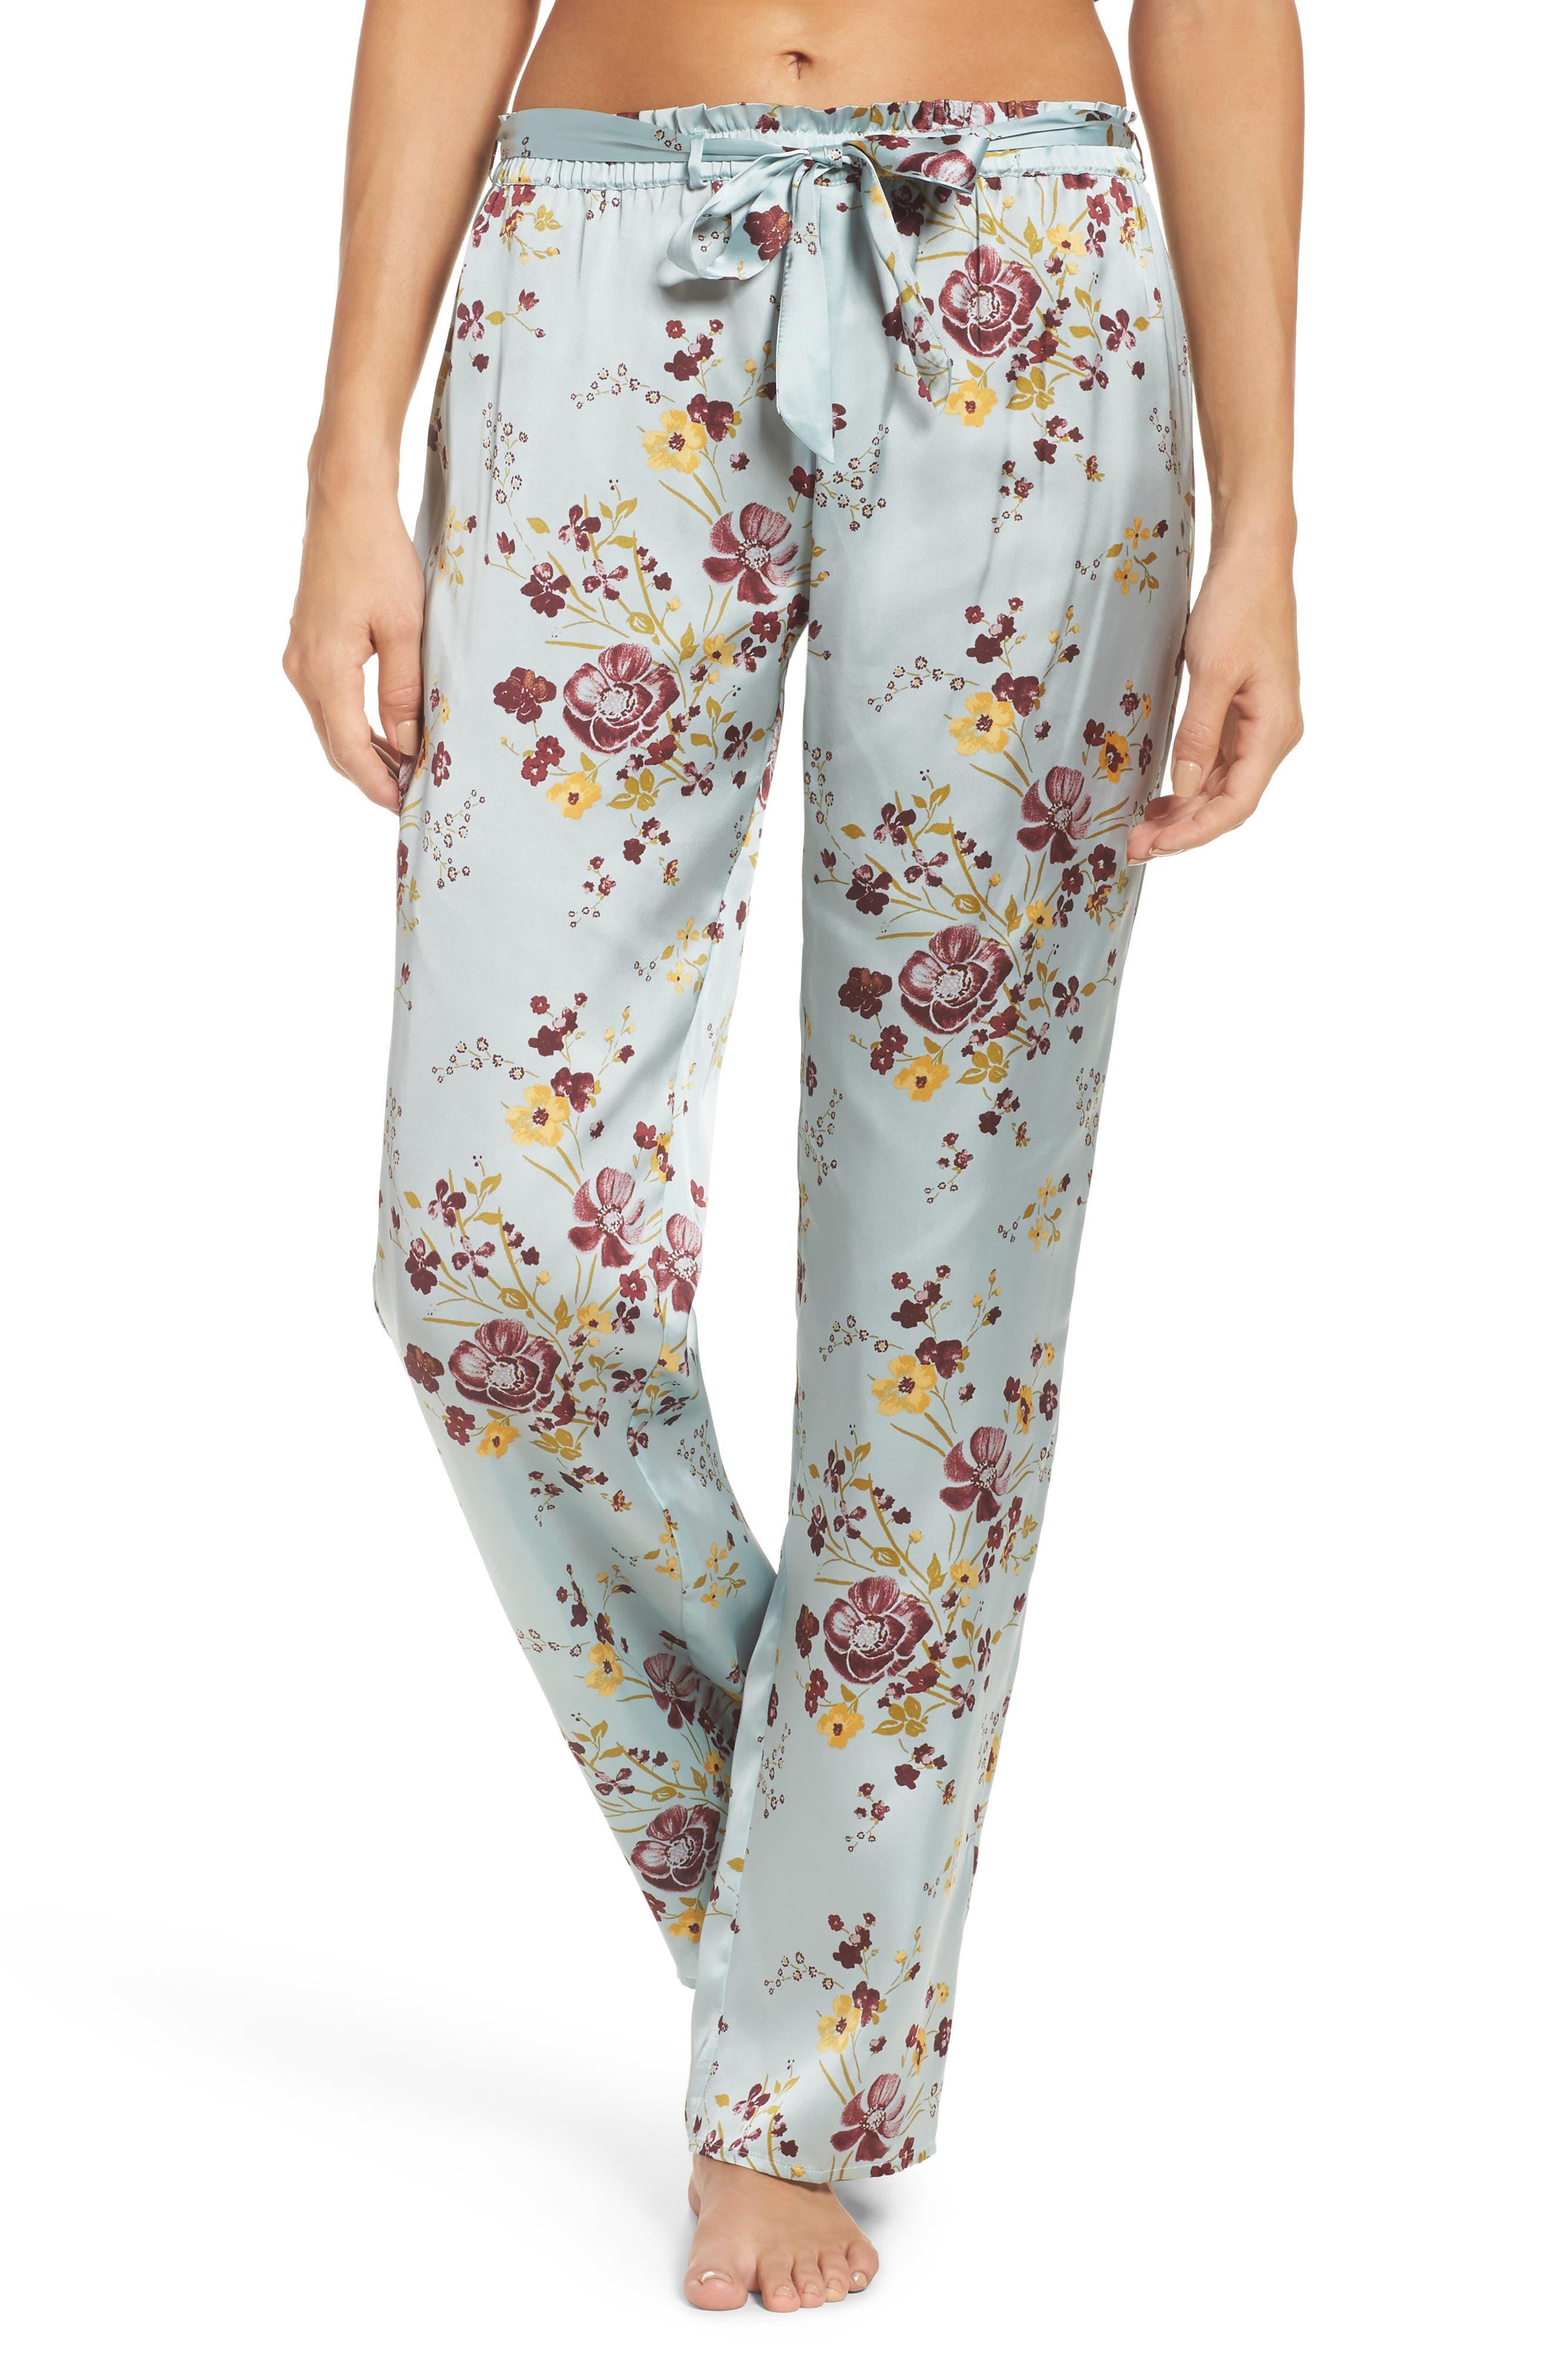 In My Dreams Pajama Pants,                         Main,                         color, Blue Cloud Pretty Floral